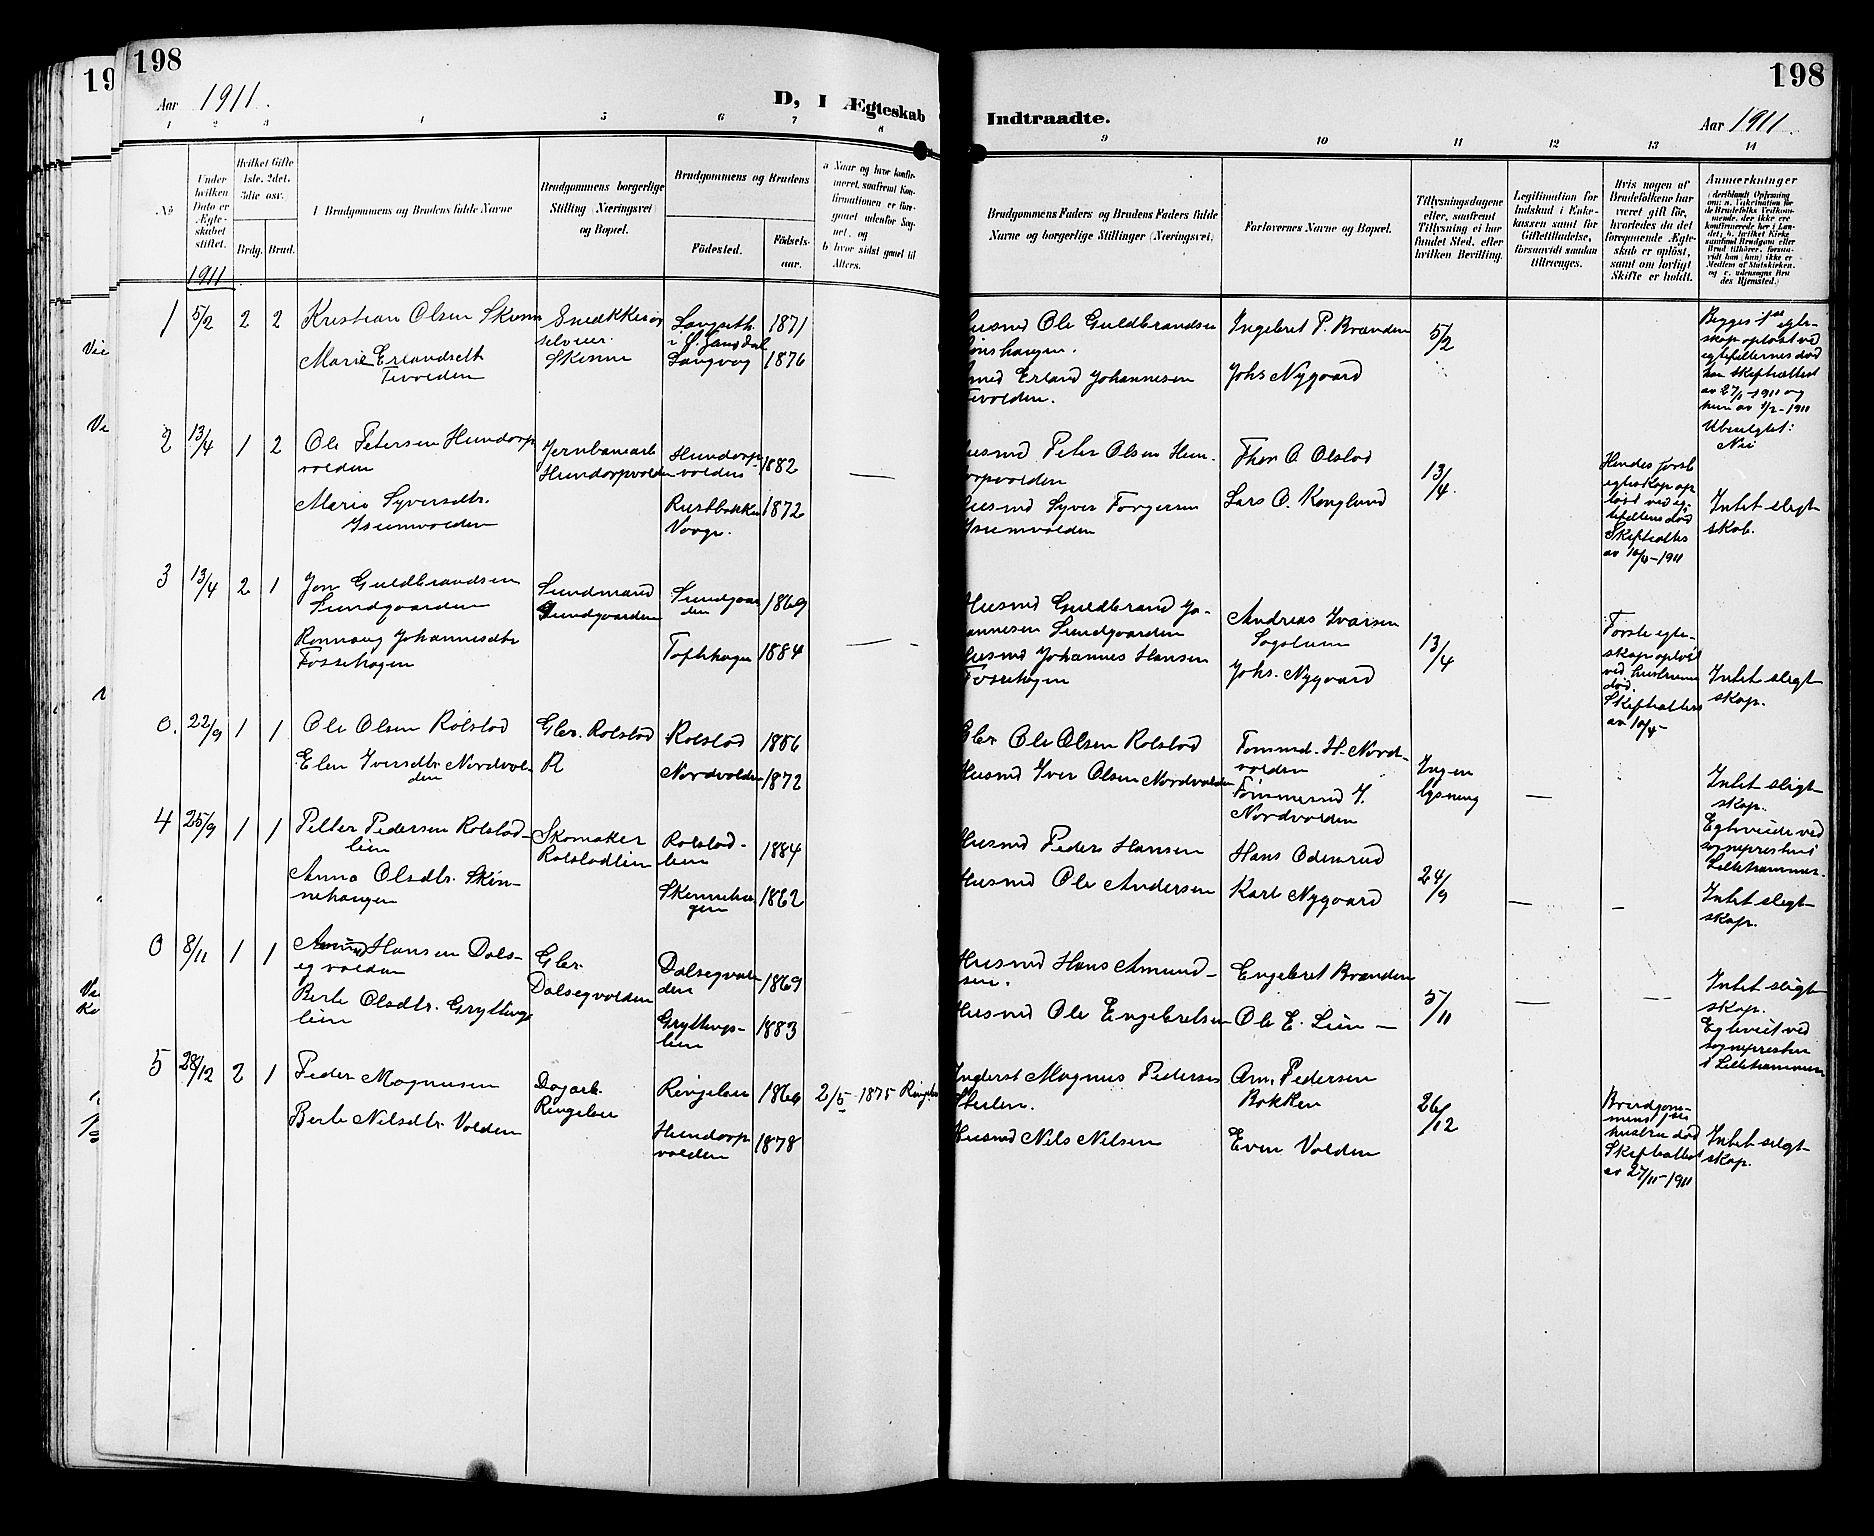 SAH, Sør-Fron prestekontor, H/Ha/Hab/L0004: Klokkerbok nr. 4, 1896-1911, s. 198